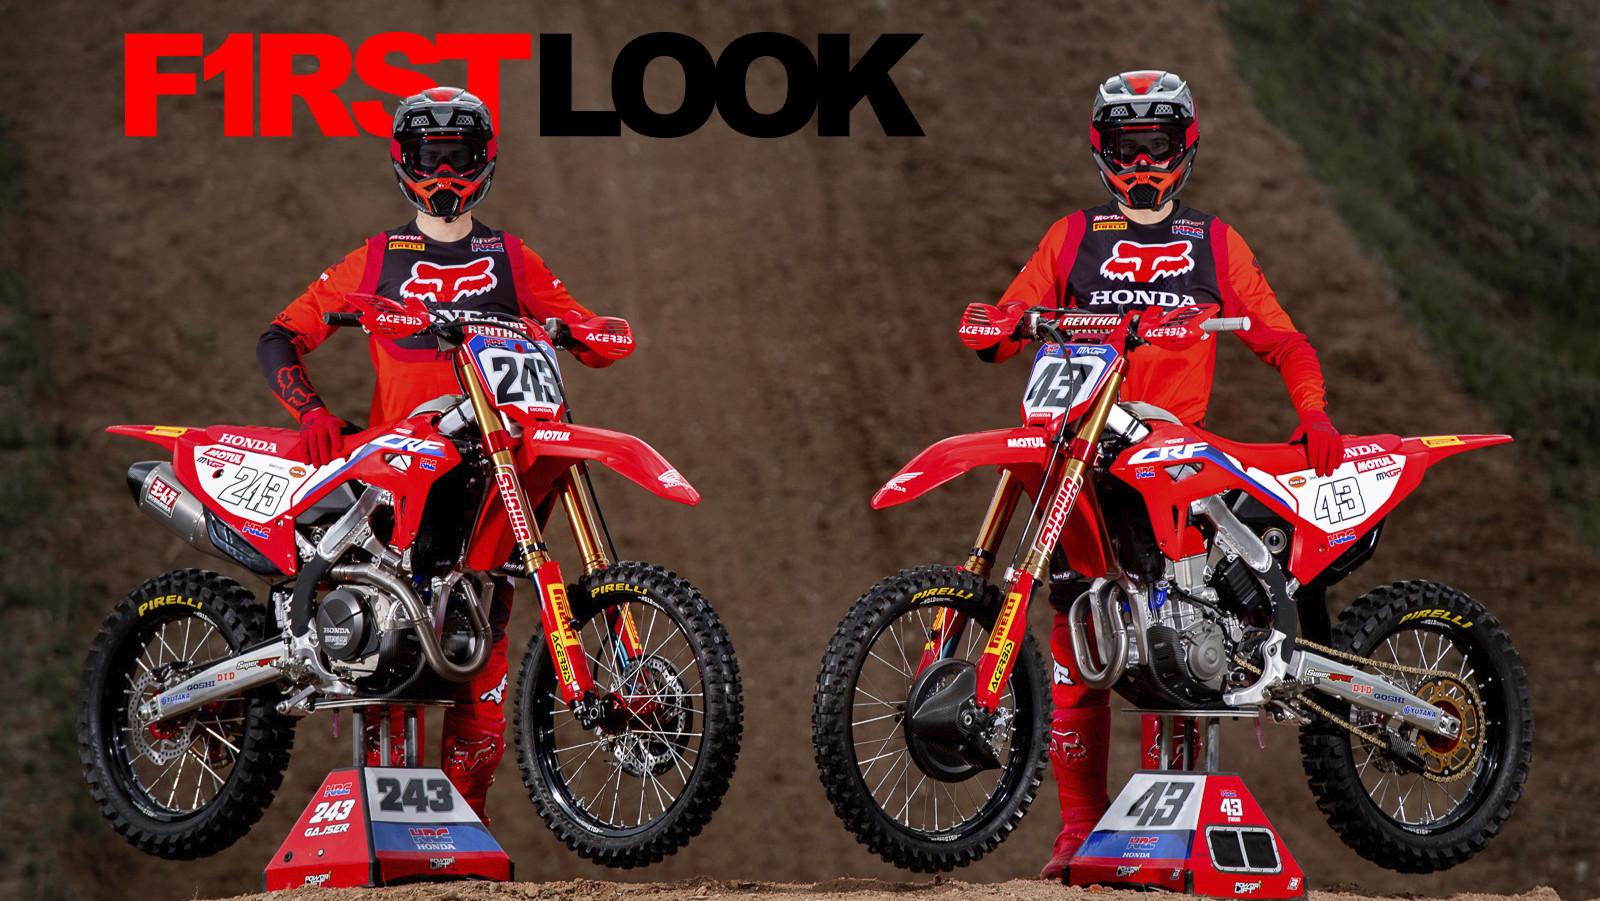 First Look: 2021 MXGP Team HRC